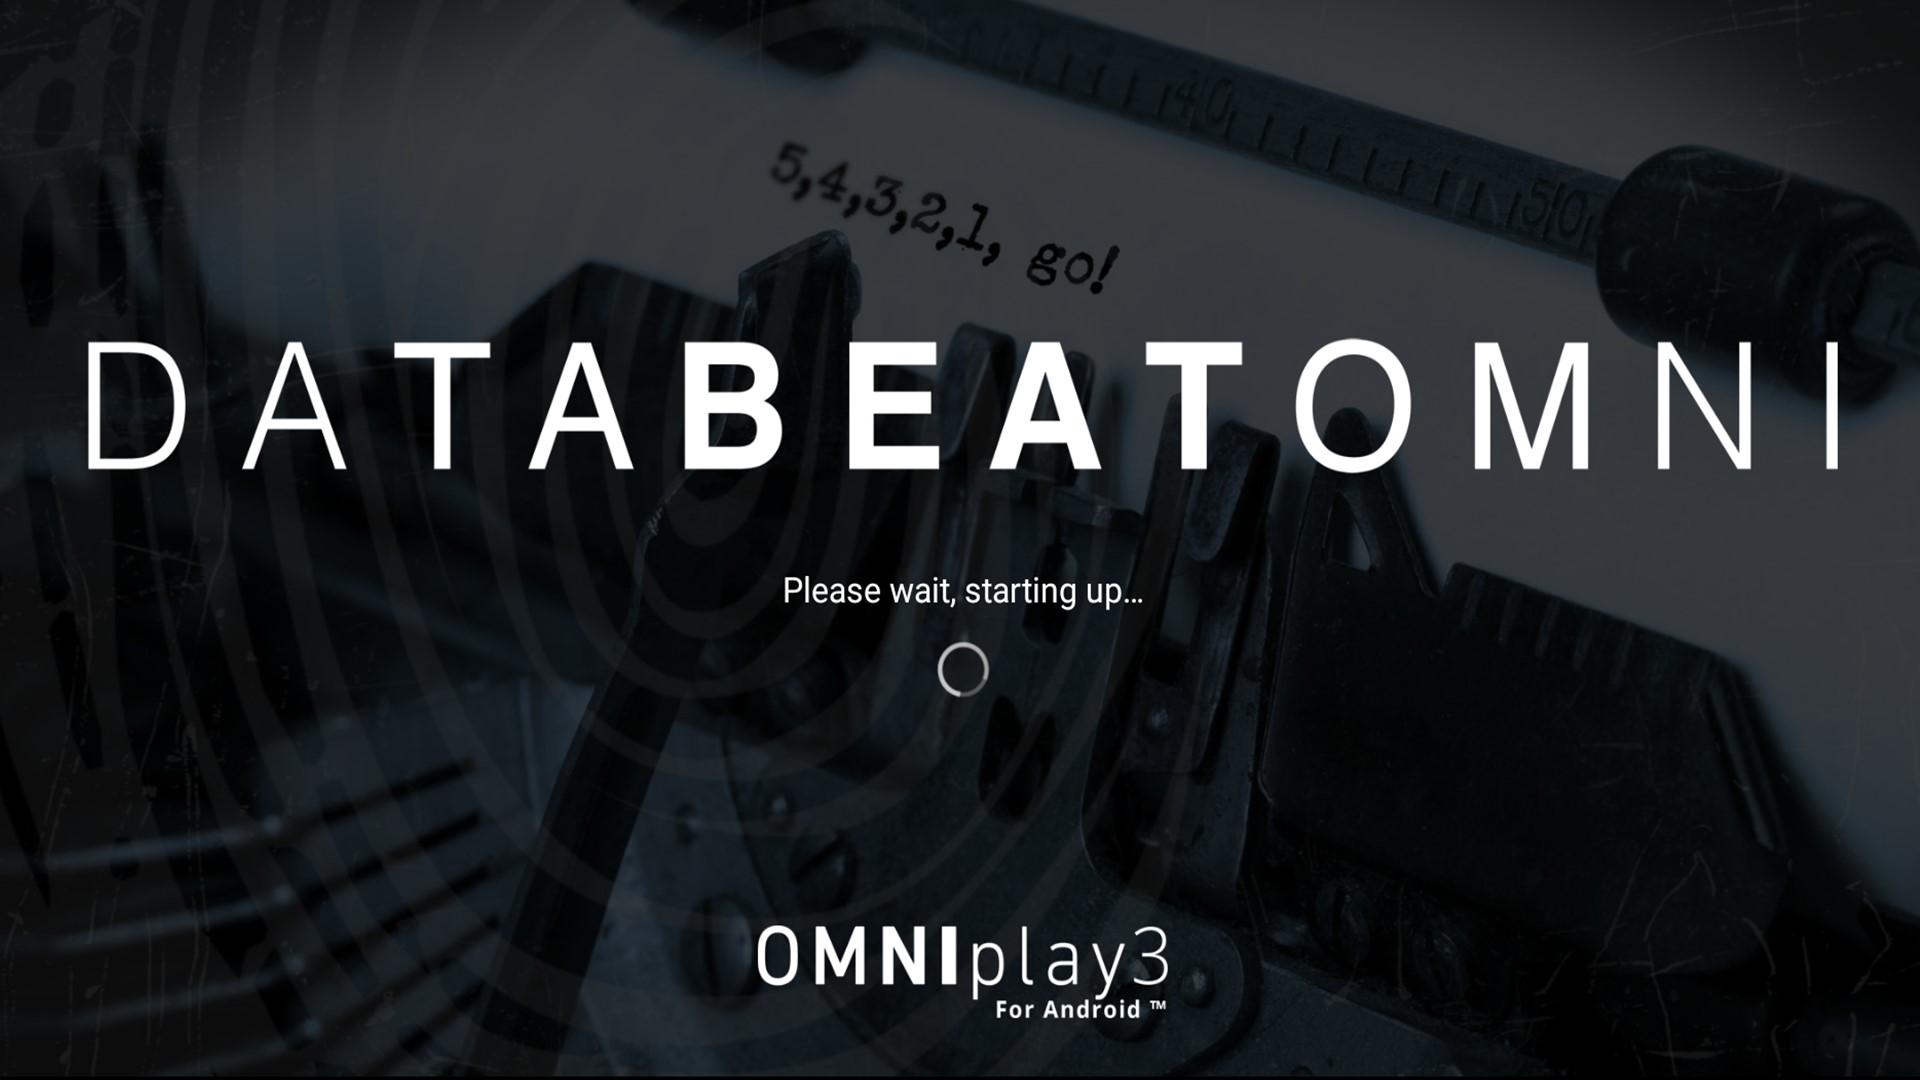 Databeat OMNIplay3 DatabeatOMNI Please wait, starting up